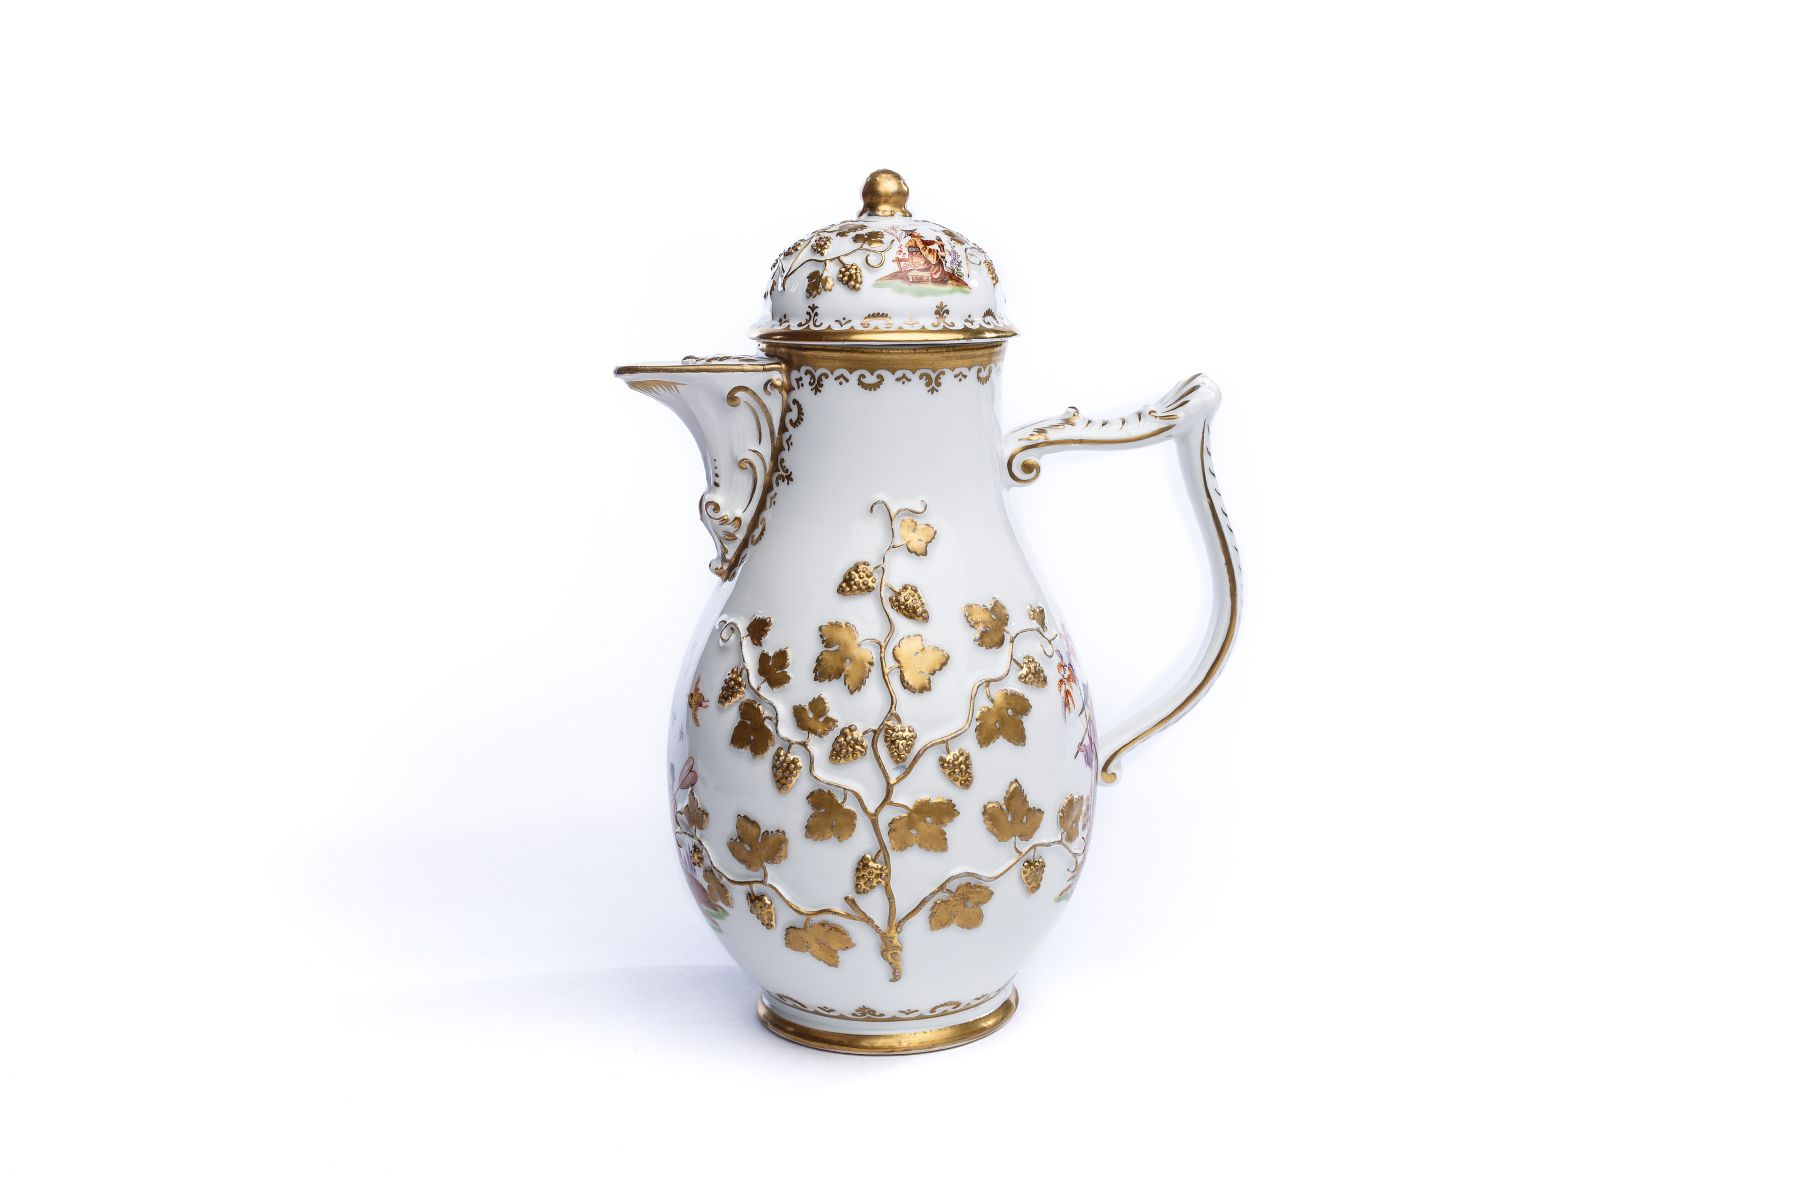 #59 Coffee pot, Meissen mid-18th century | Kaffeekanne, Meissen Mitte 18. Jhdt Image